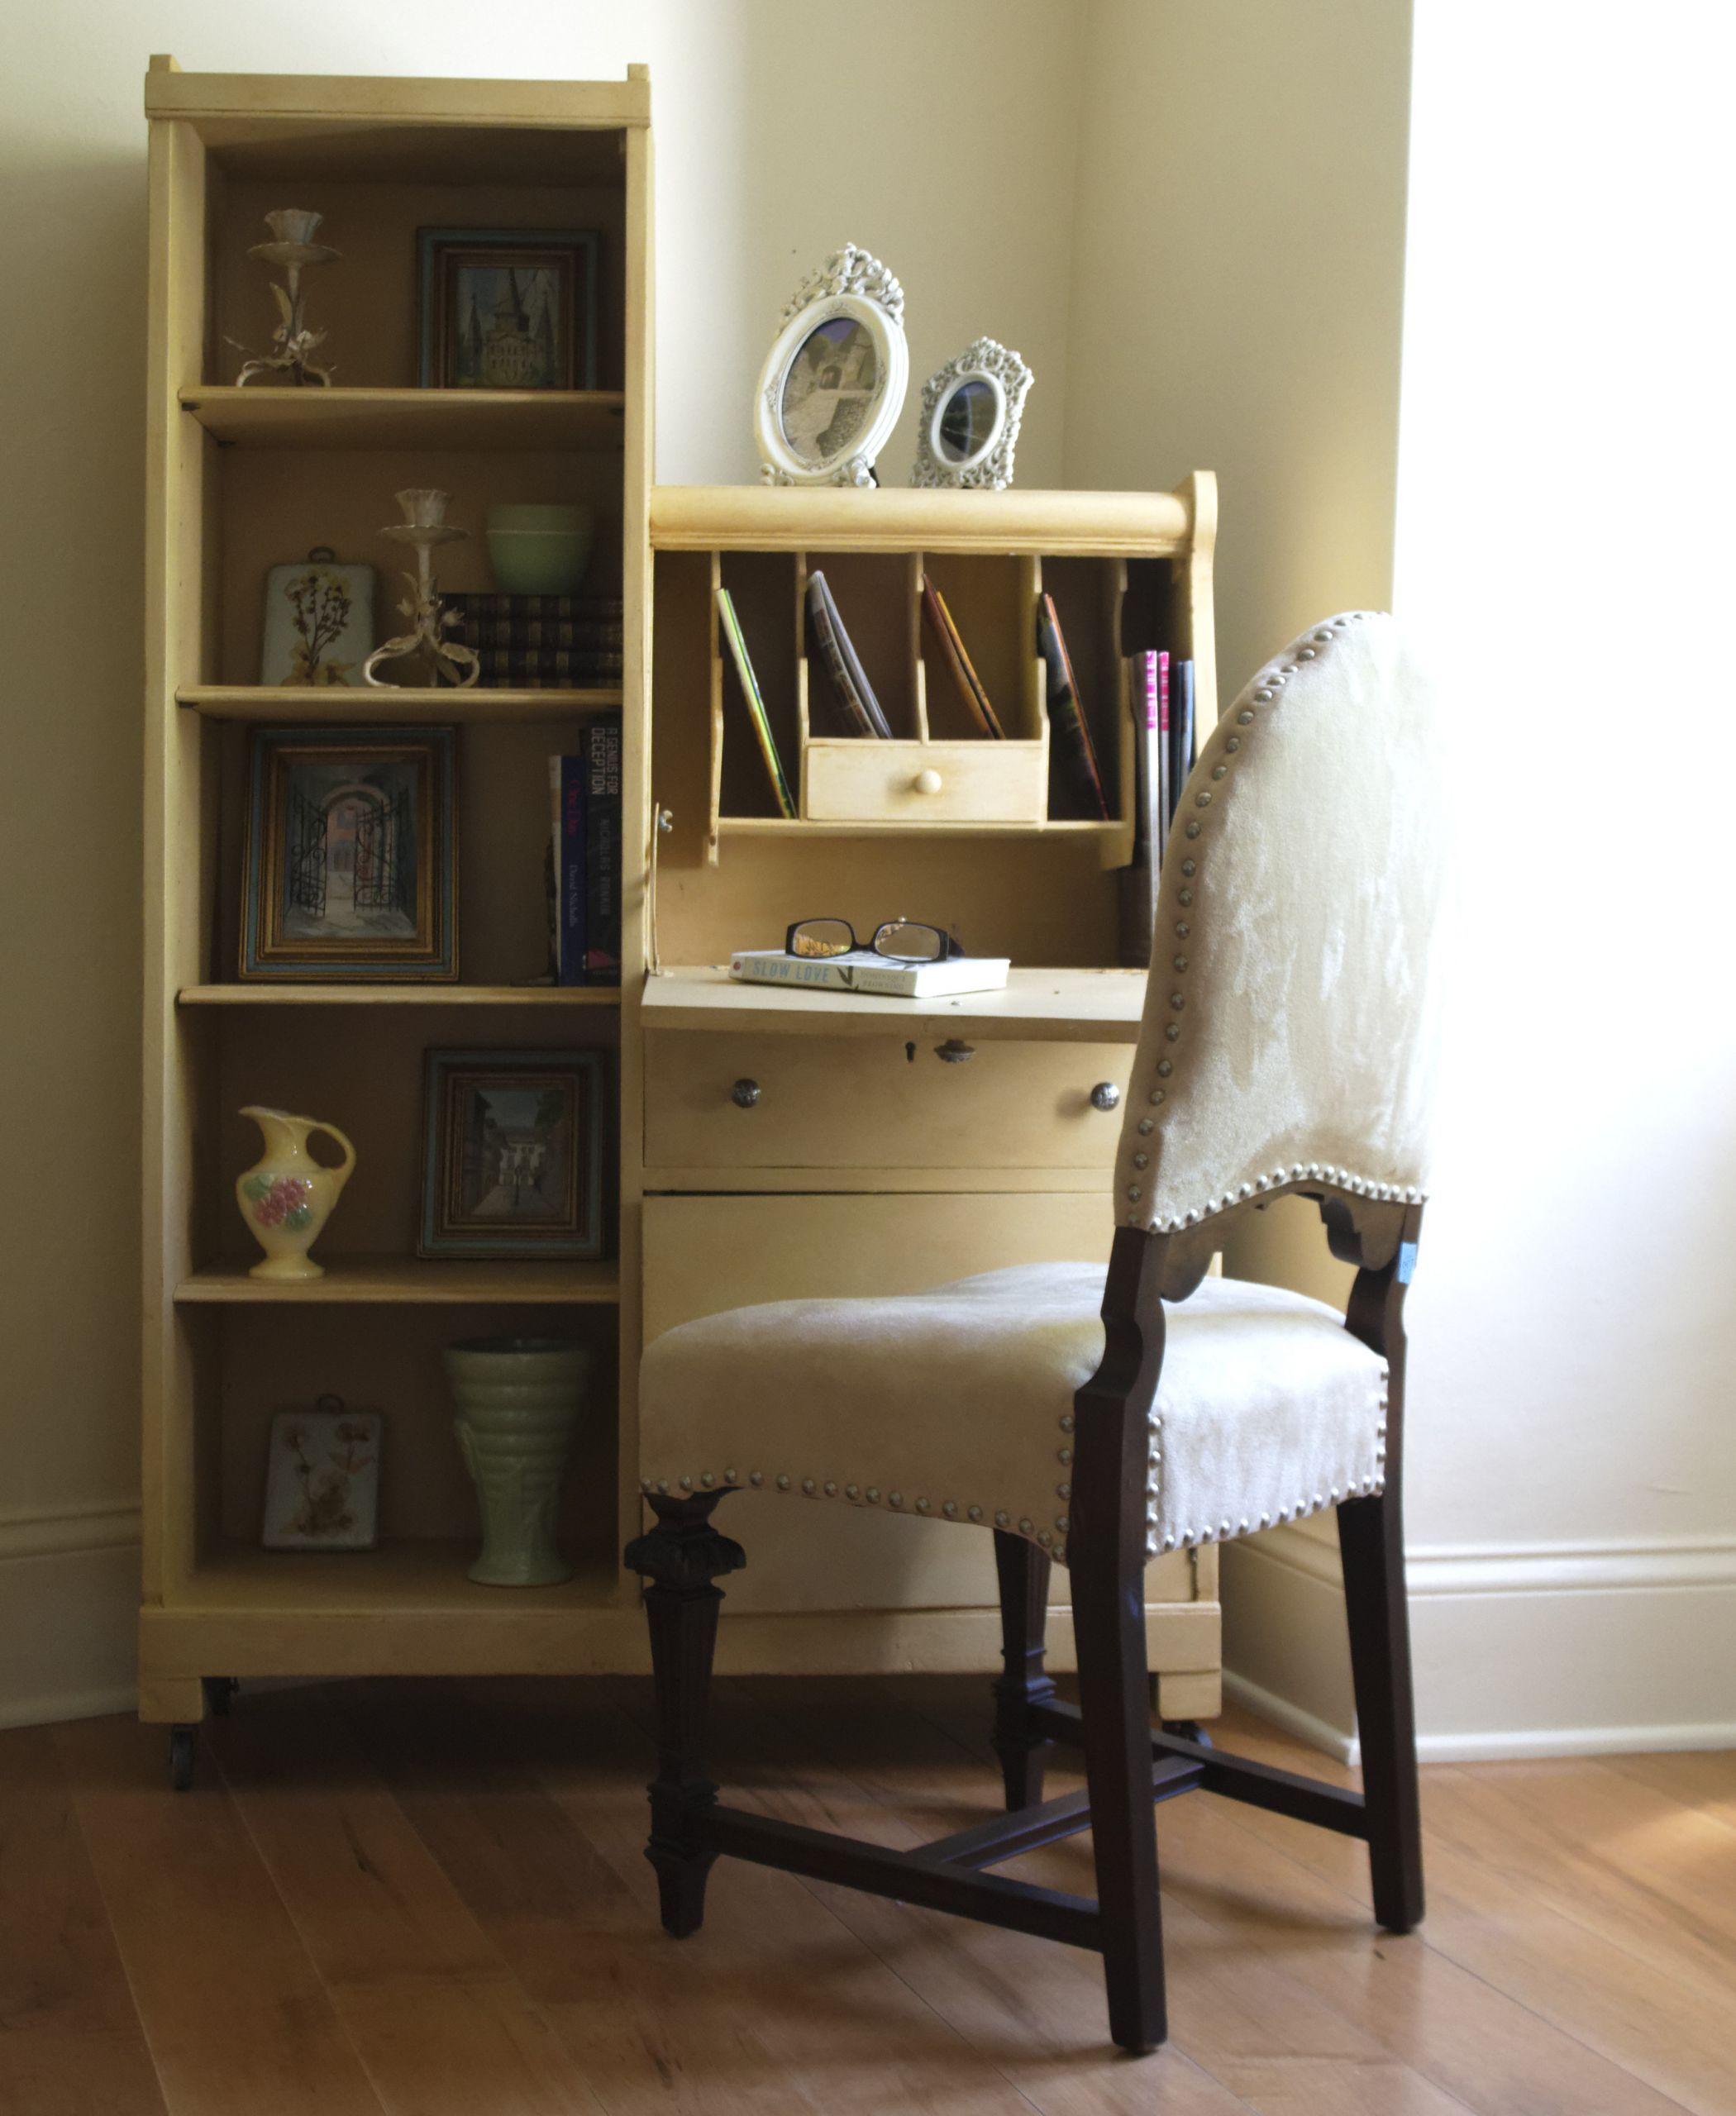 Bookcase Desk Diy Elegant Plans for Building A Small